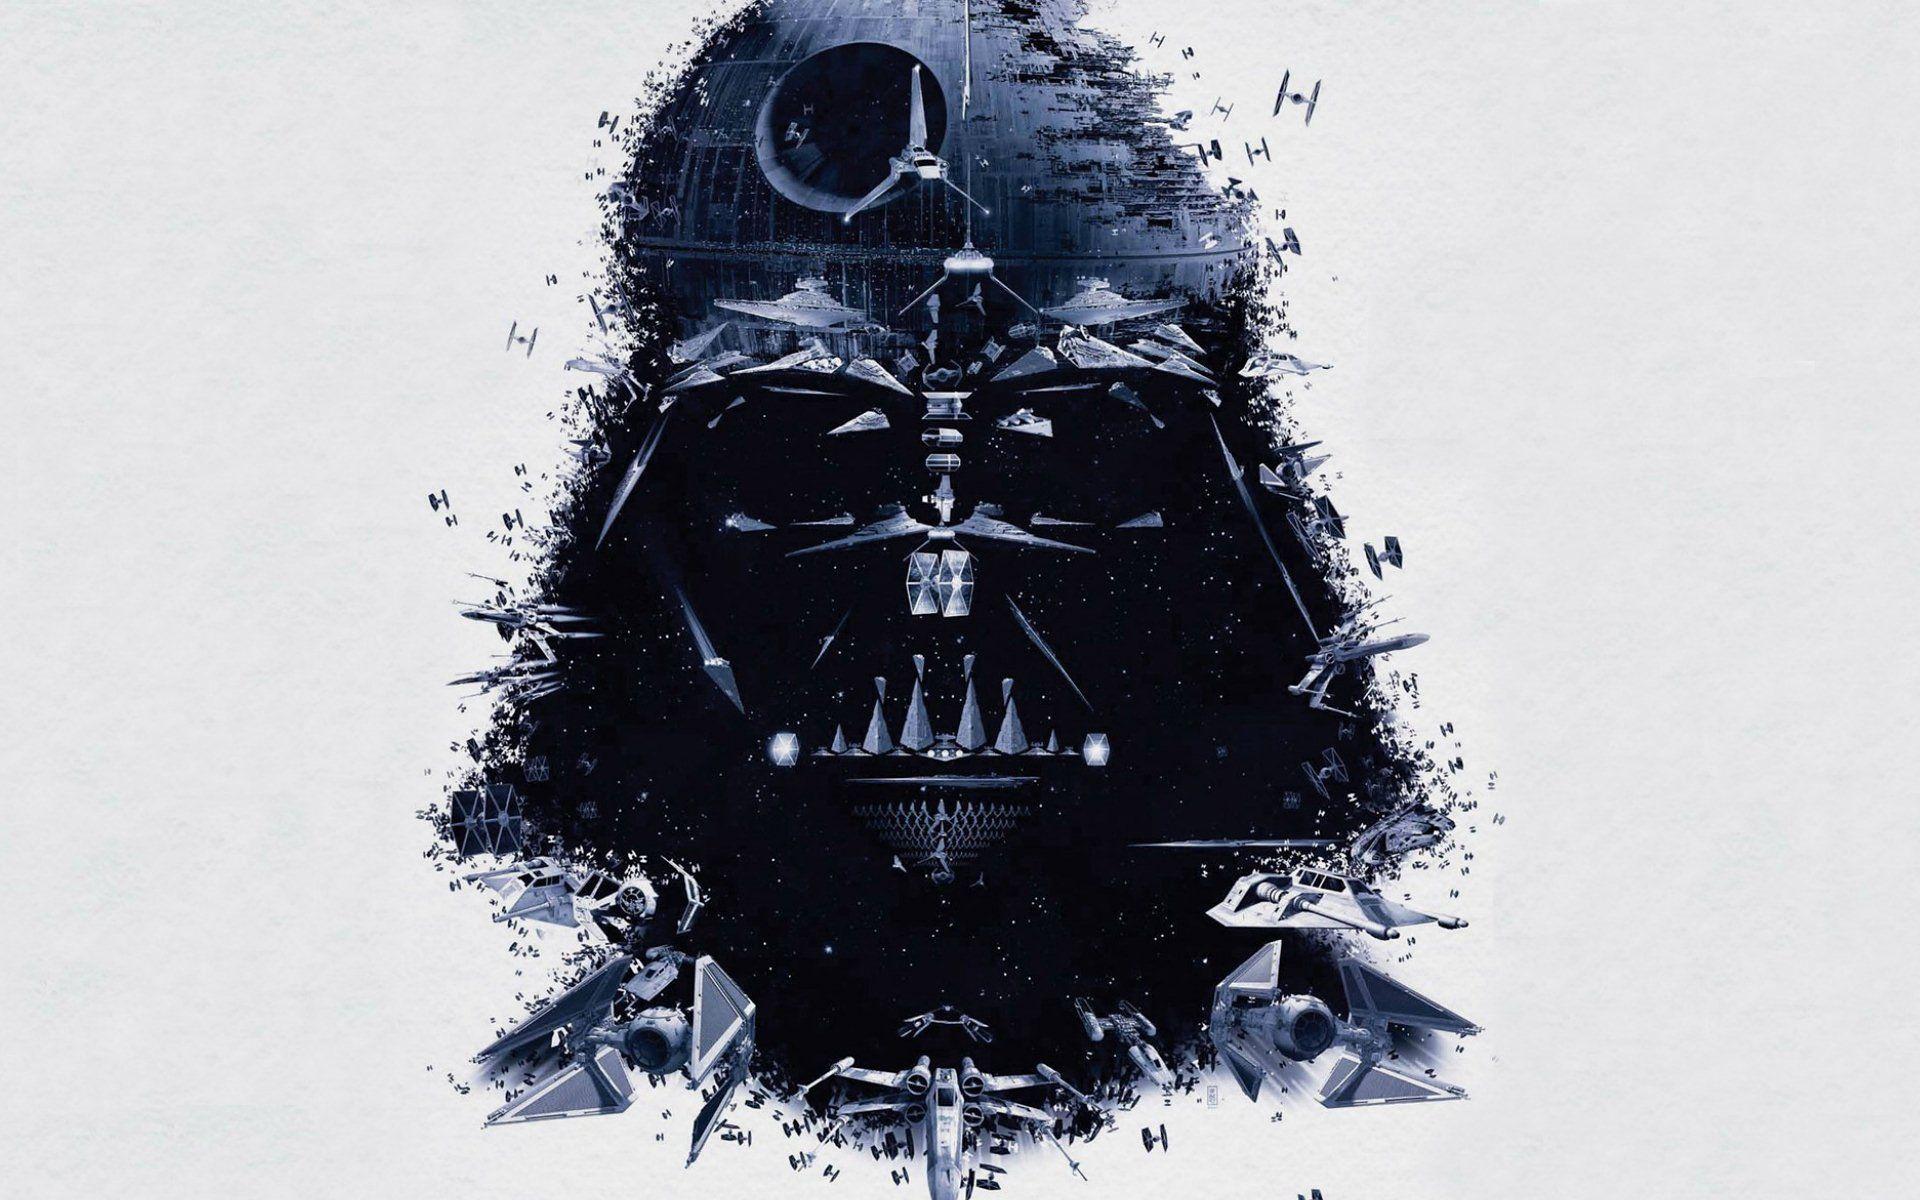 Get Inspired For 2160p 4k Ultra Hd Darth Vader Wallpaper Hd Wallpaper In 2020 Star Wars Wallpaper Vader Star Wars Star Wars Poster